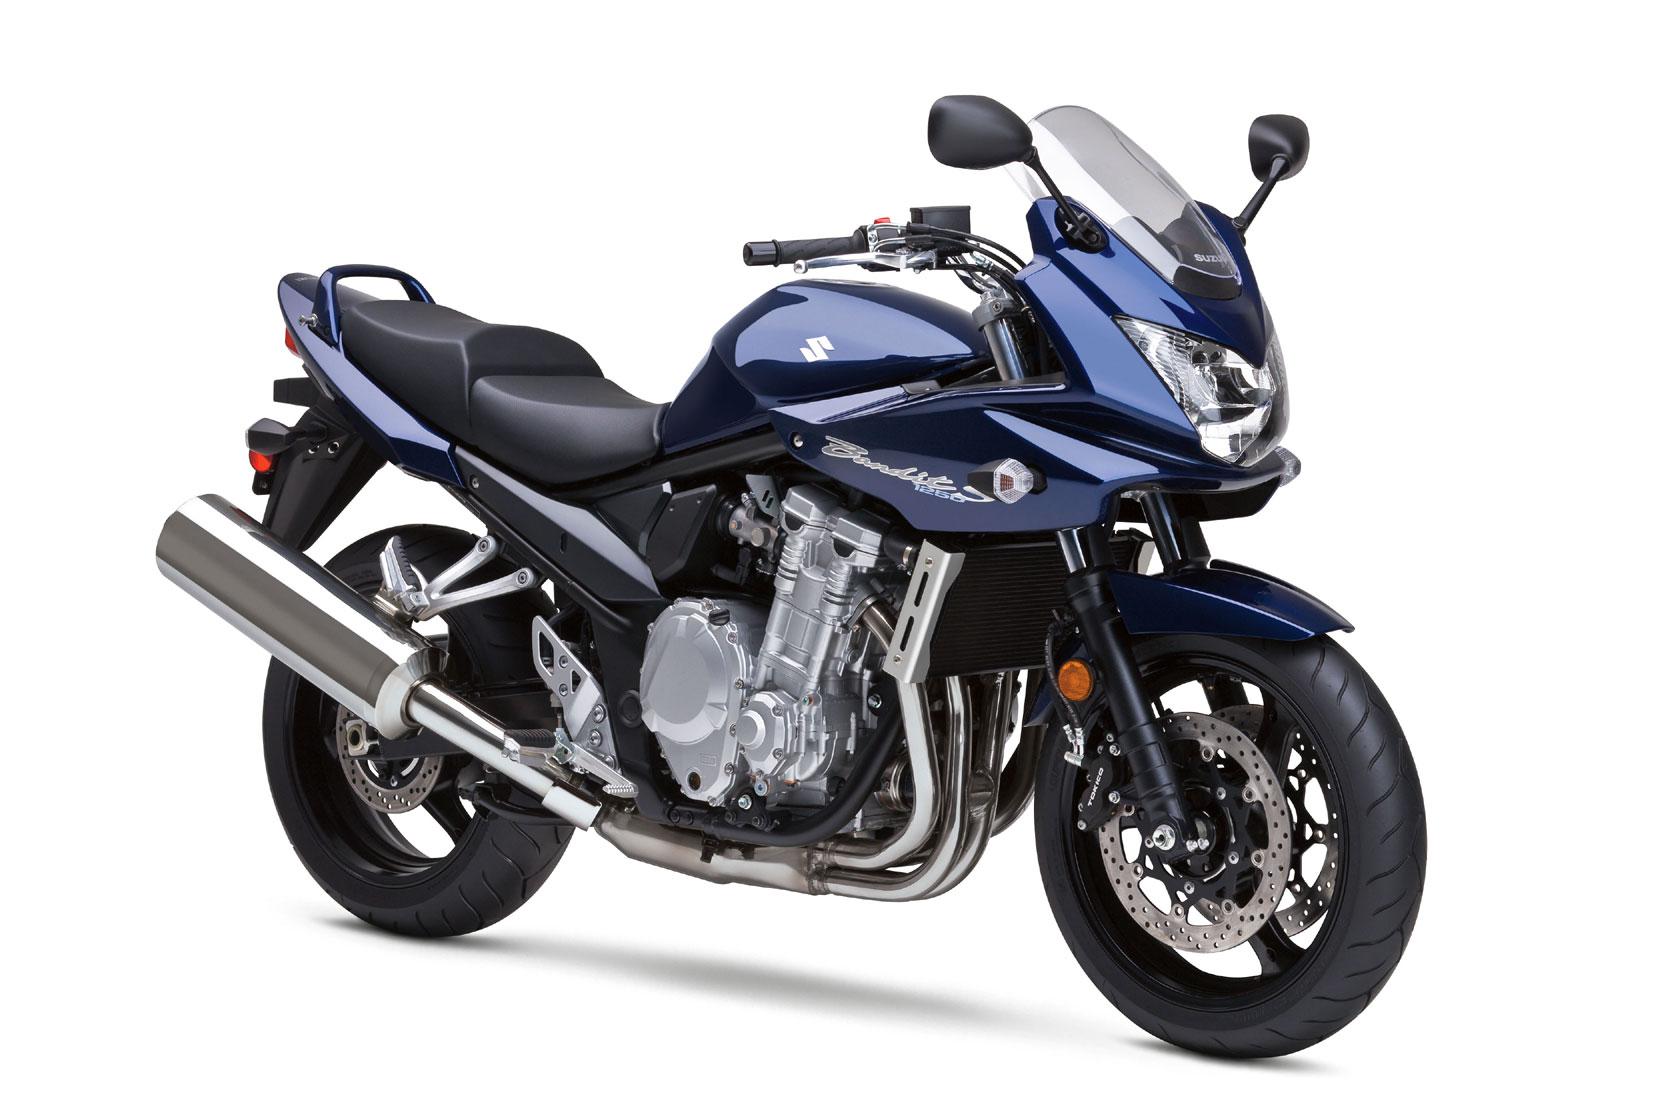 Fotos bandit 650 suzuki de motos picture car interior design